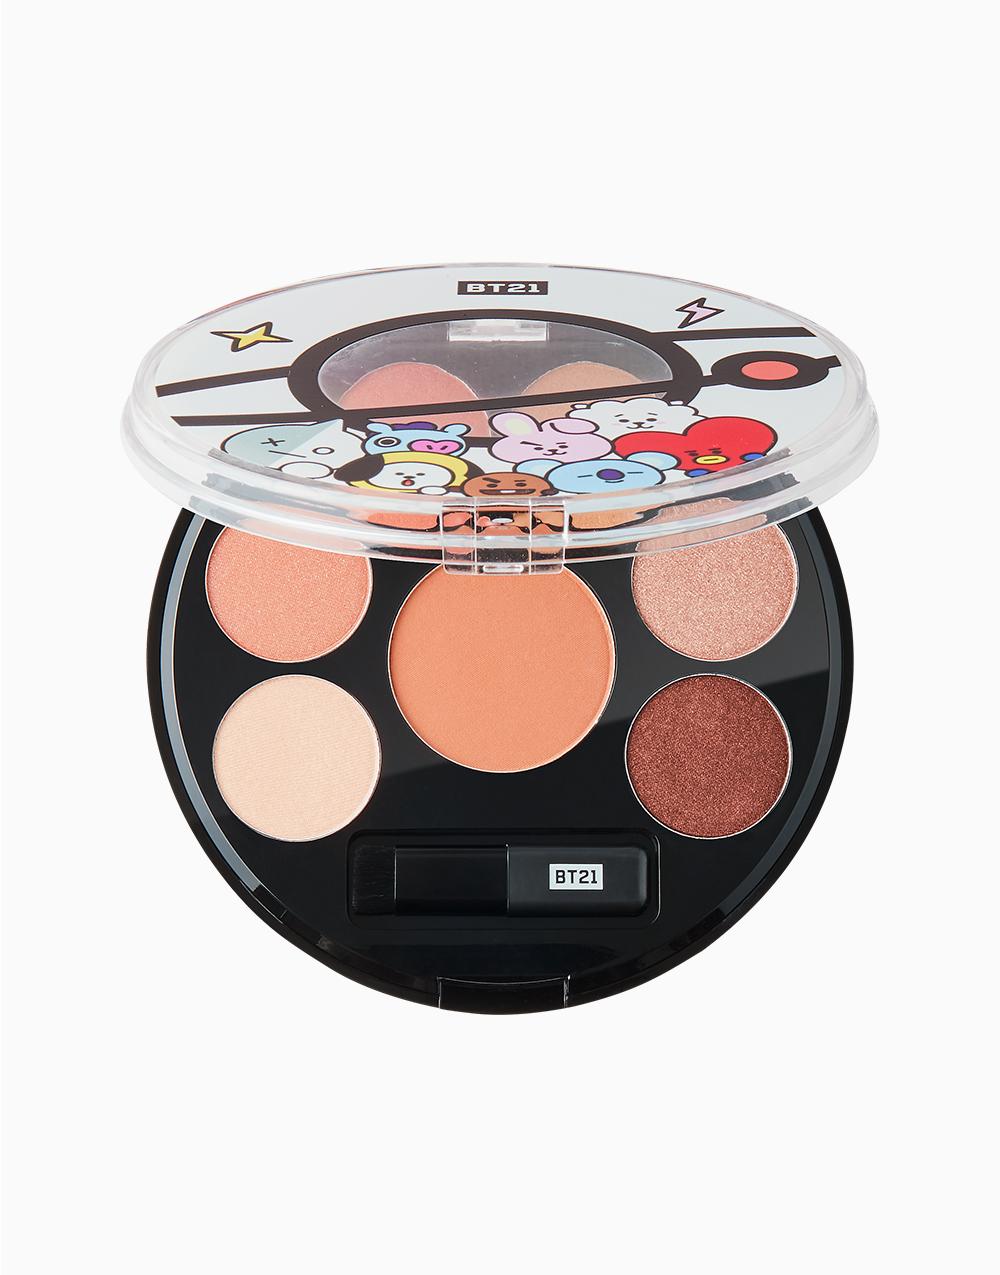 BT21 Eyeshadow Palette by VT Cosmetics   Mood Brown